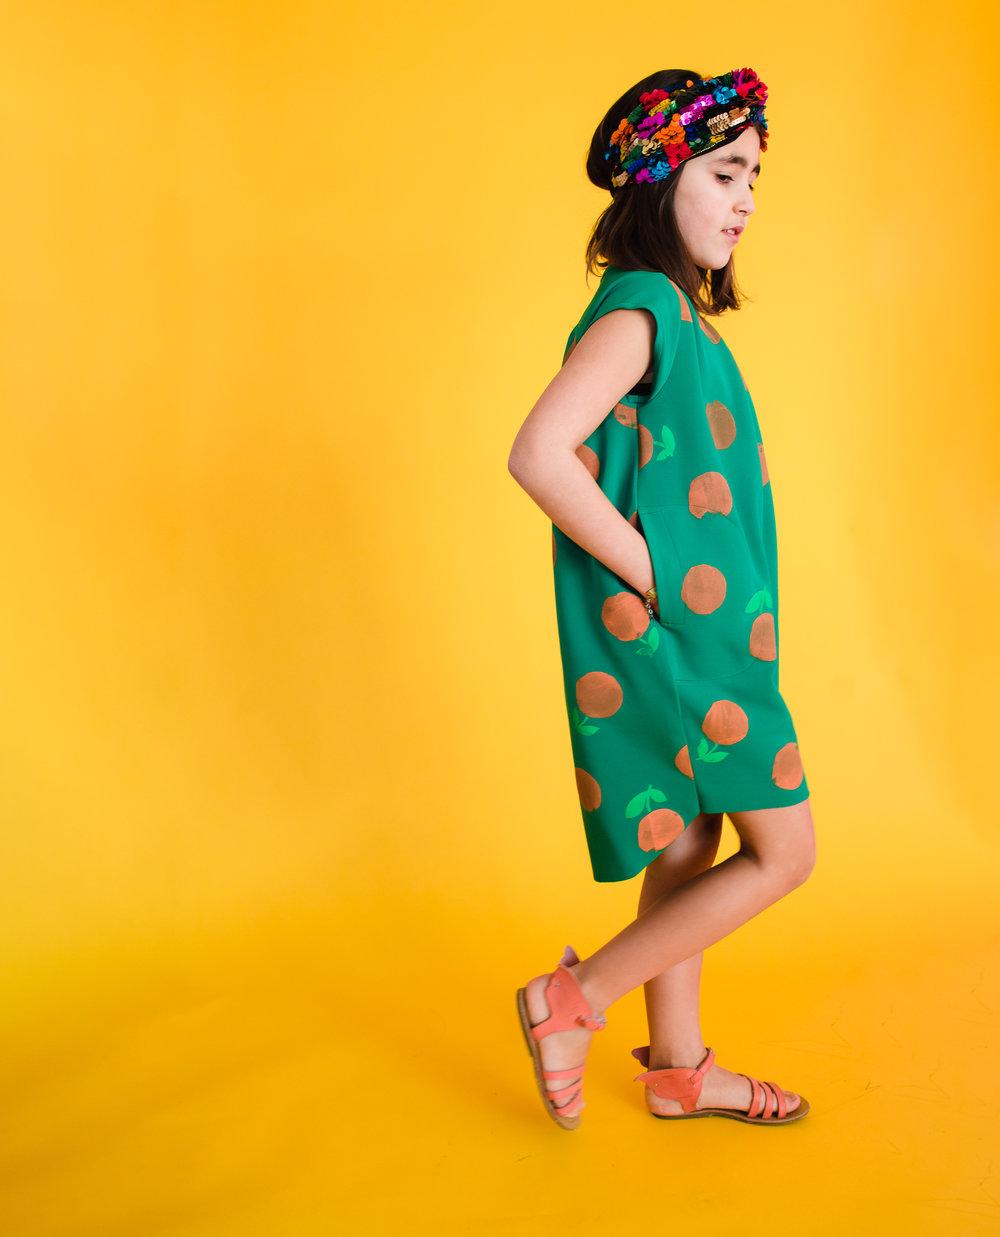 prp-kids-sewing-patterns02.jpg